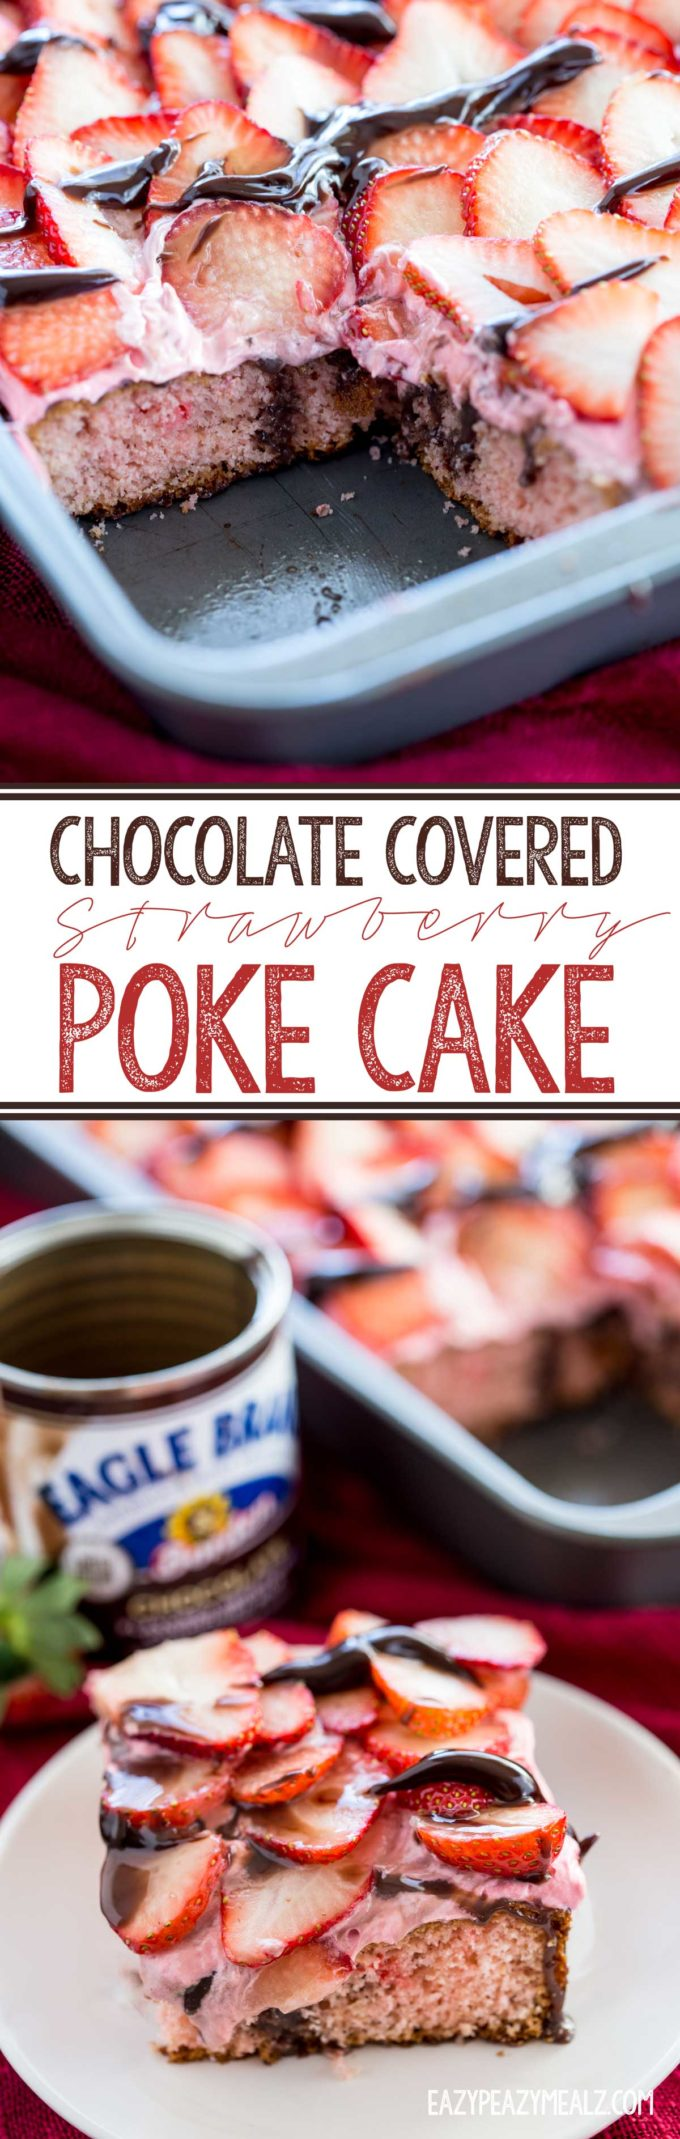 Pin-strawberry-poke-cake